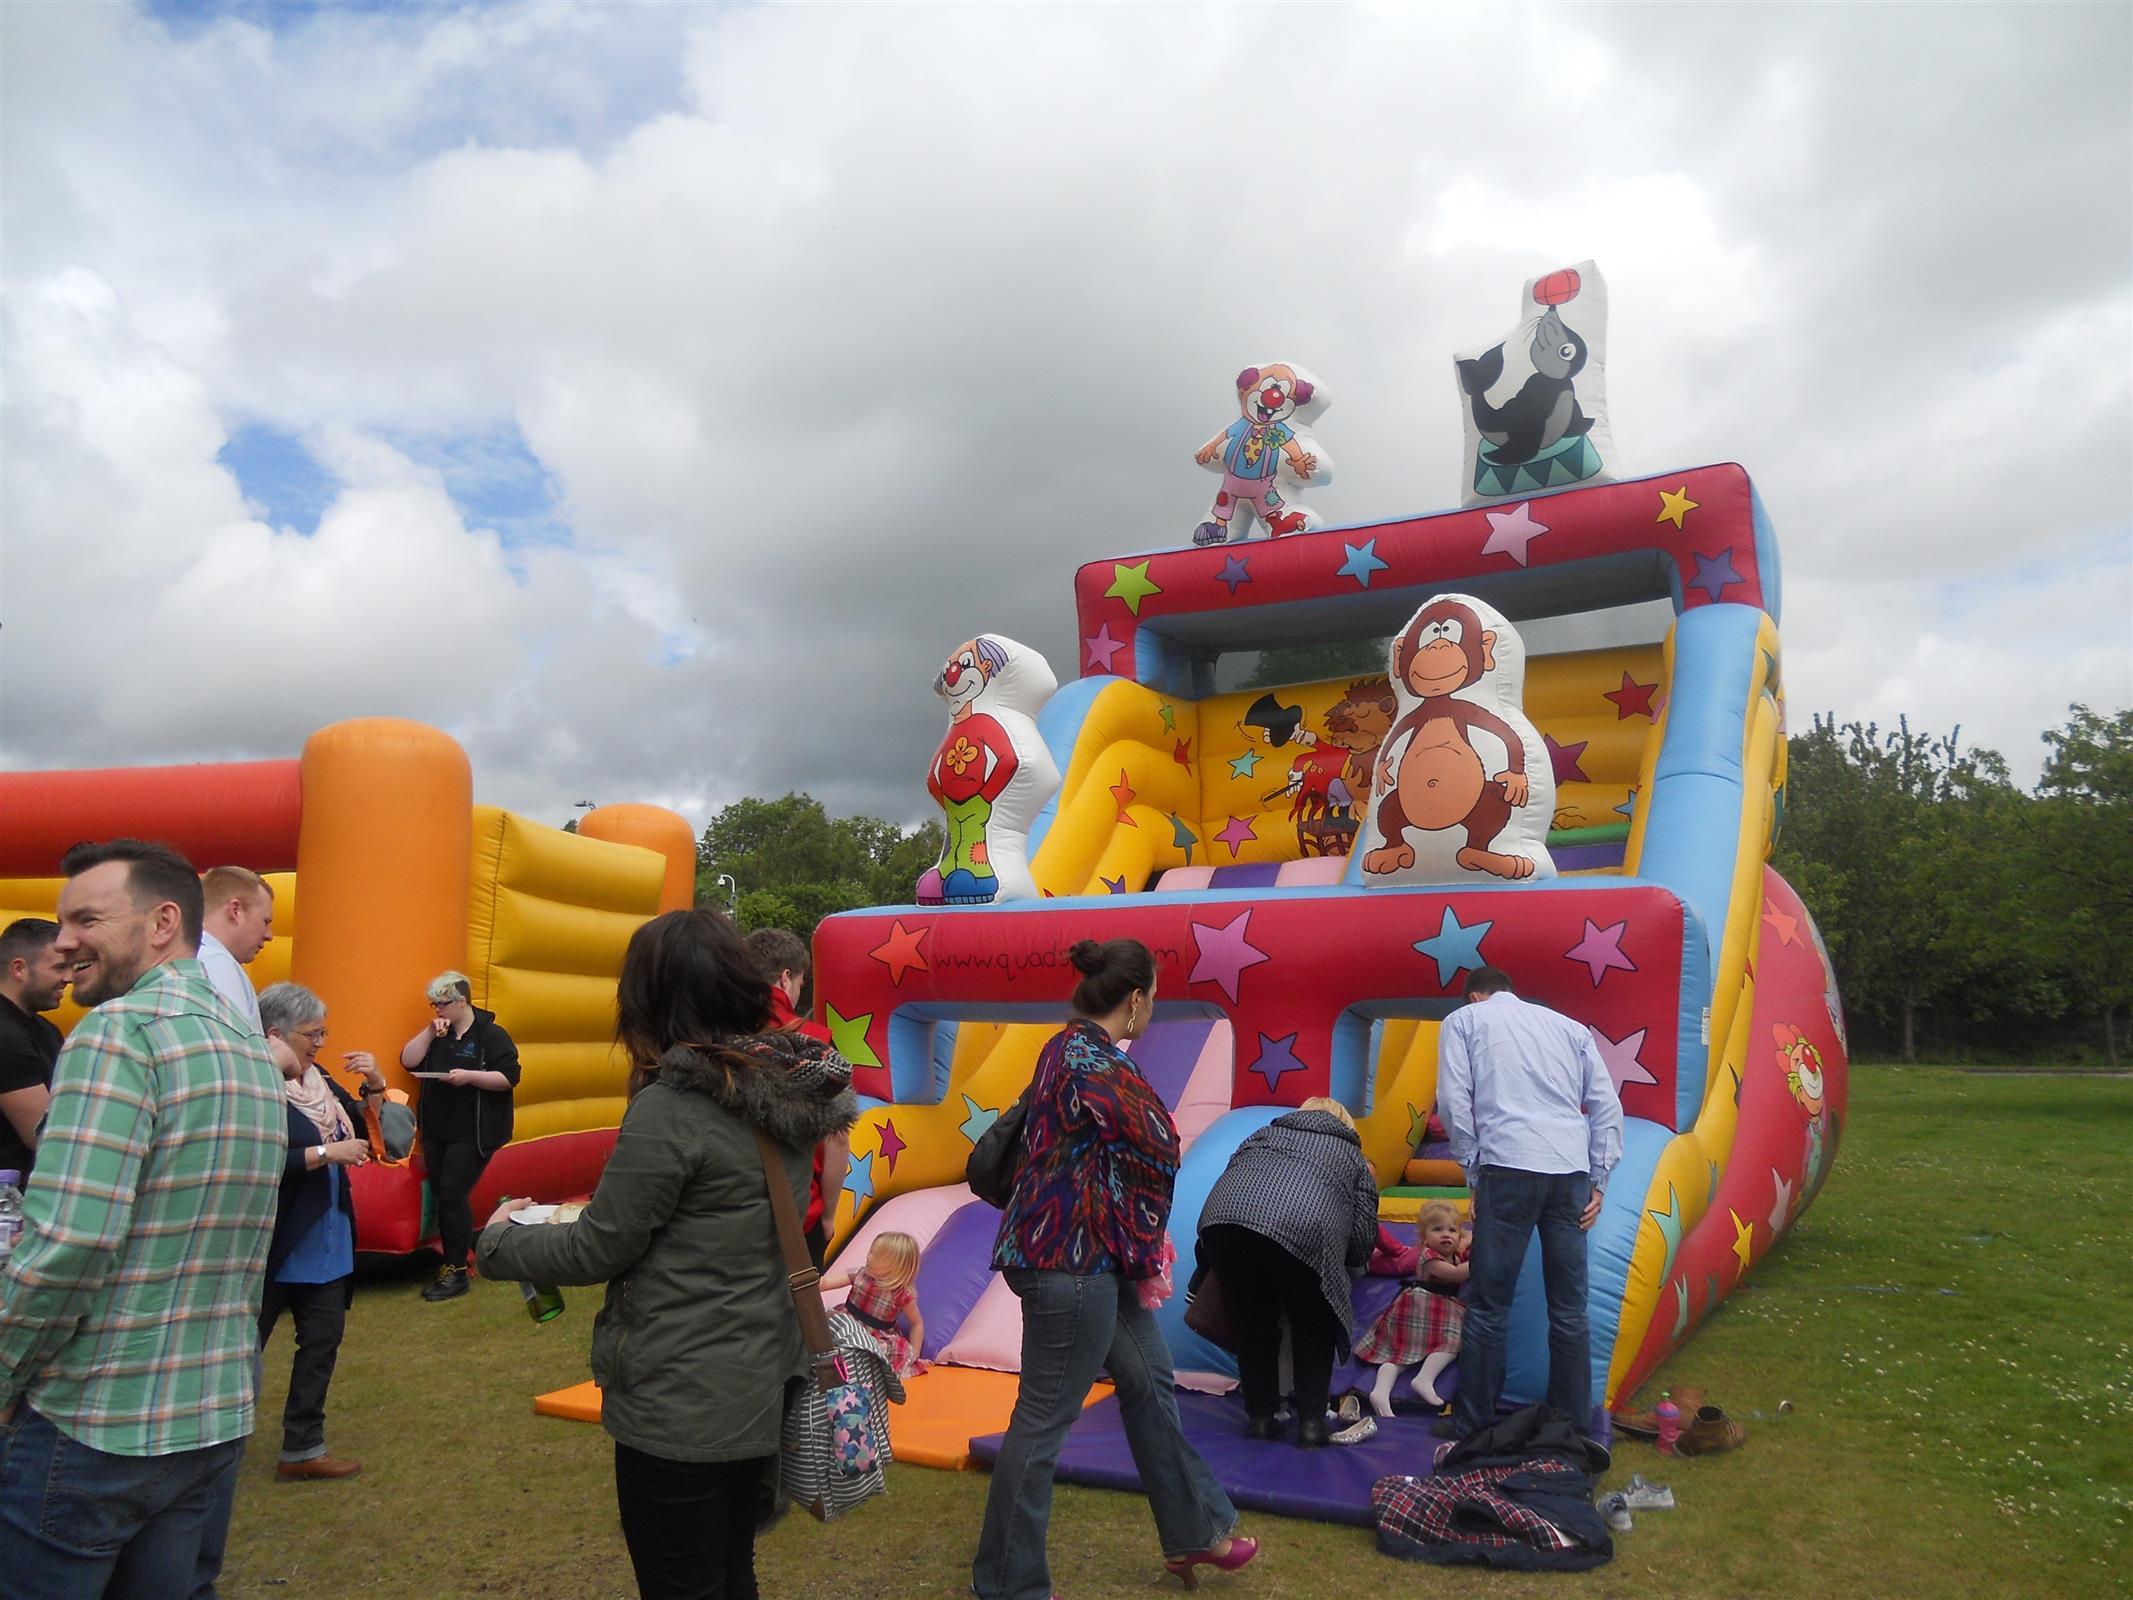 Giant Circus Slide Hire In Glasgow Fife And Edinburgh